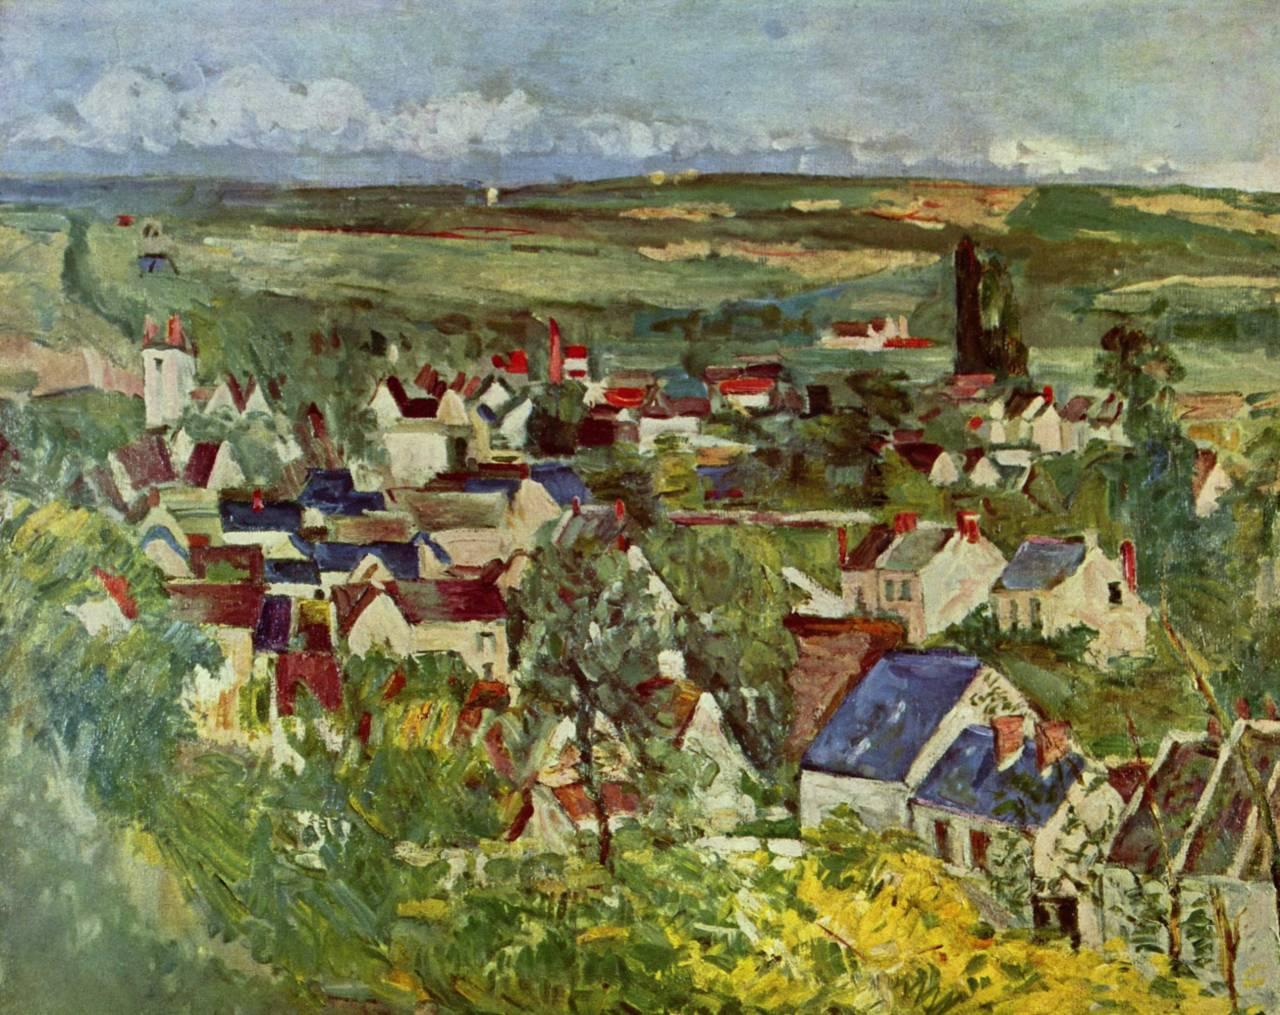 herzogtum-sachsen-weissenfels:Paul Cézanne (French, 1839-1906). View of Auvers, 1873. Oil on canvas,65 x 80cm.